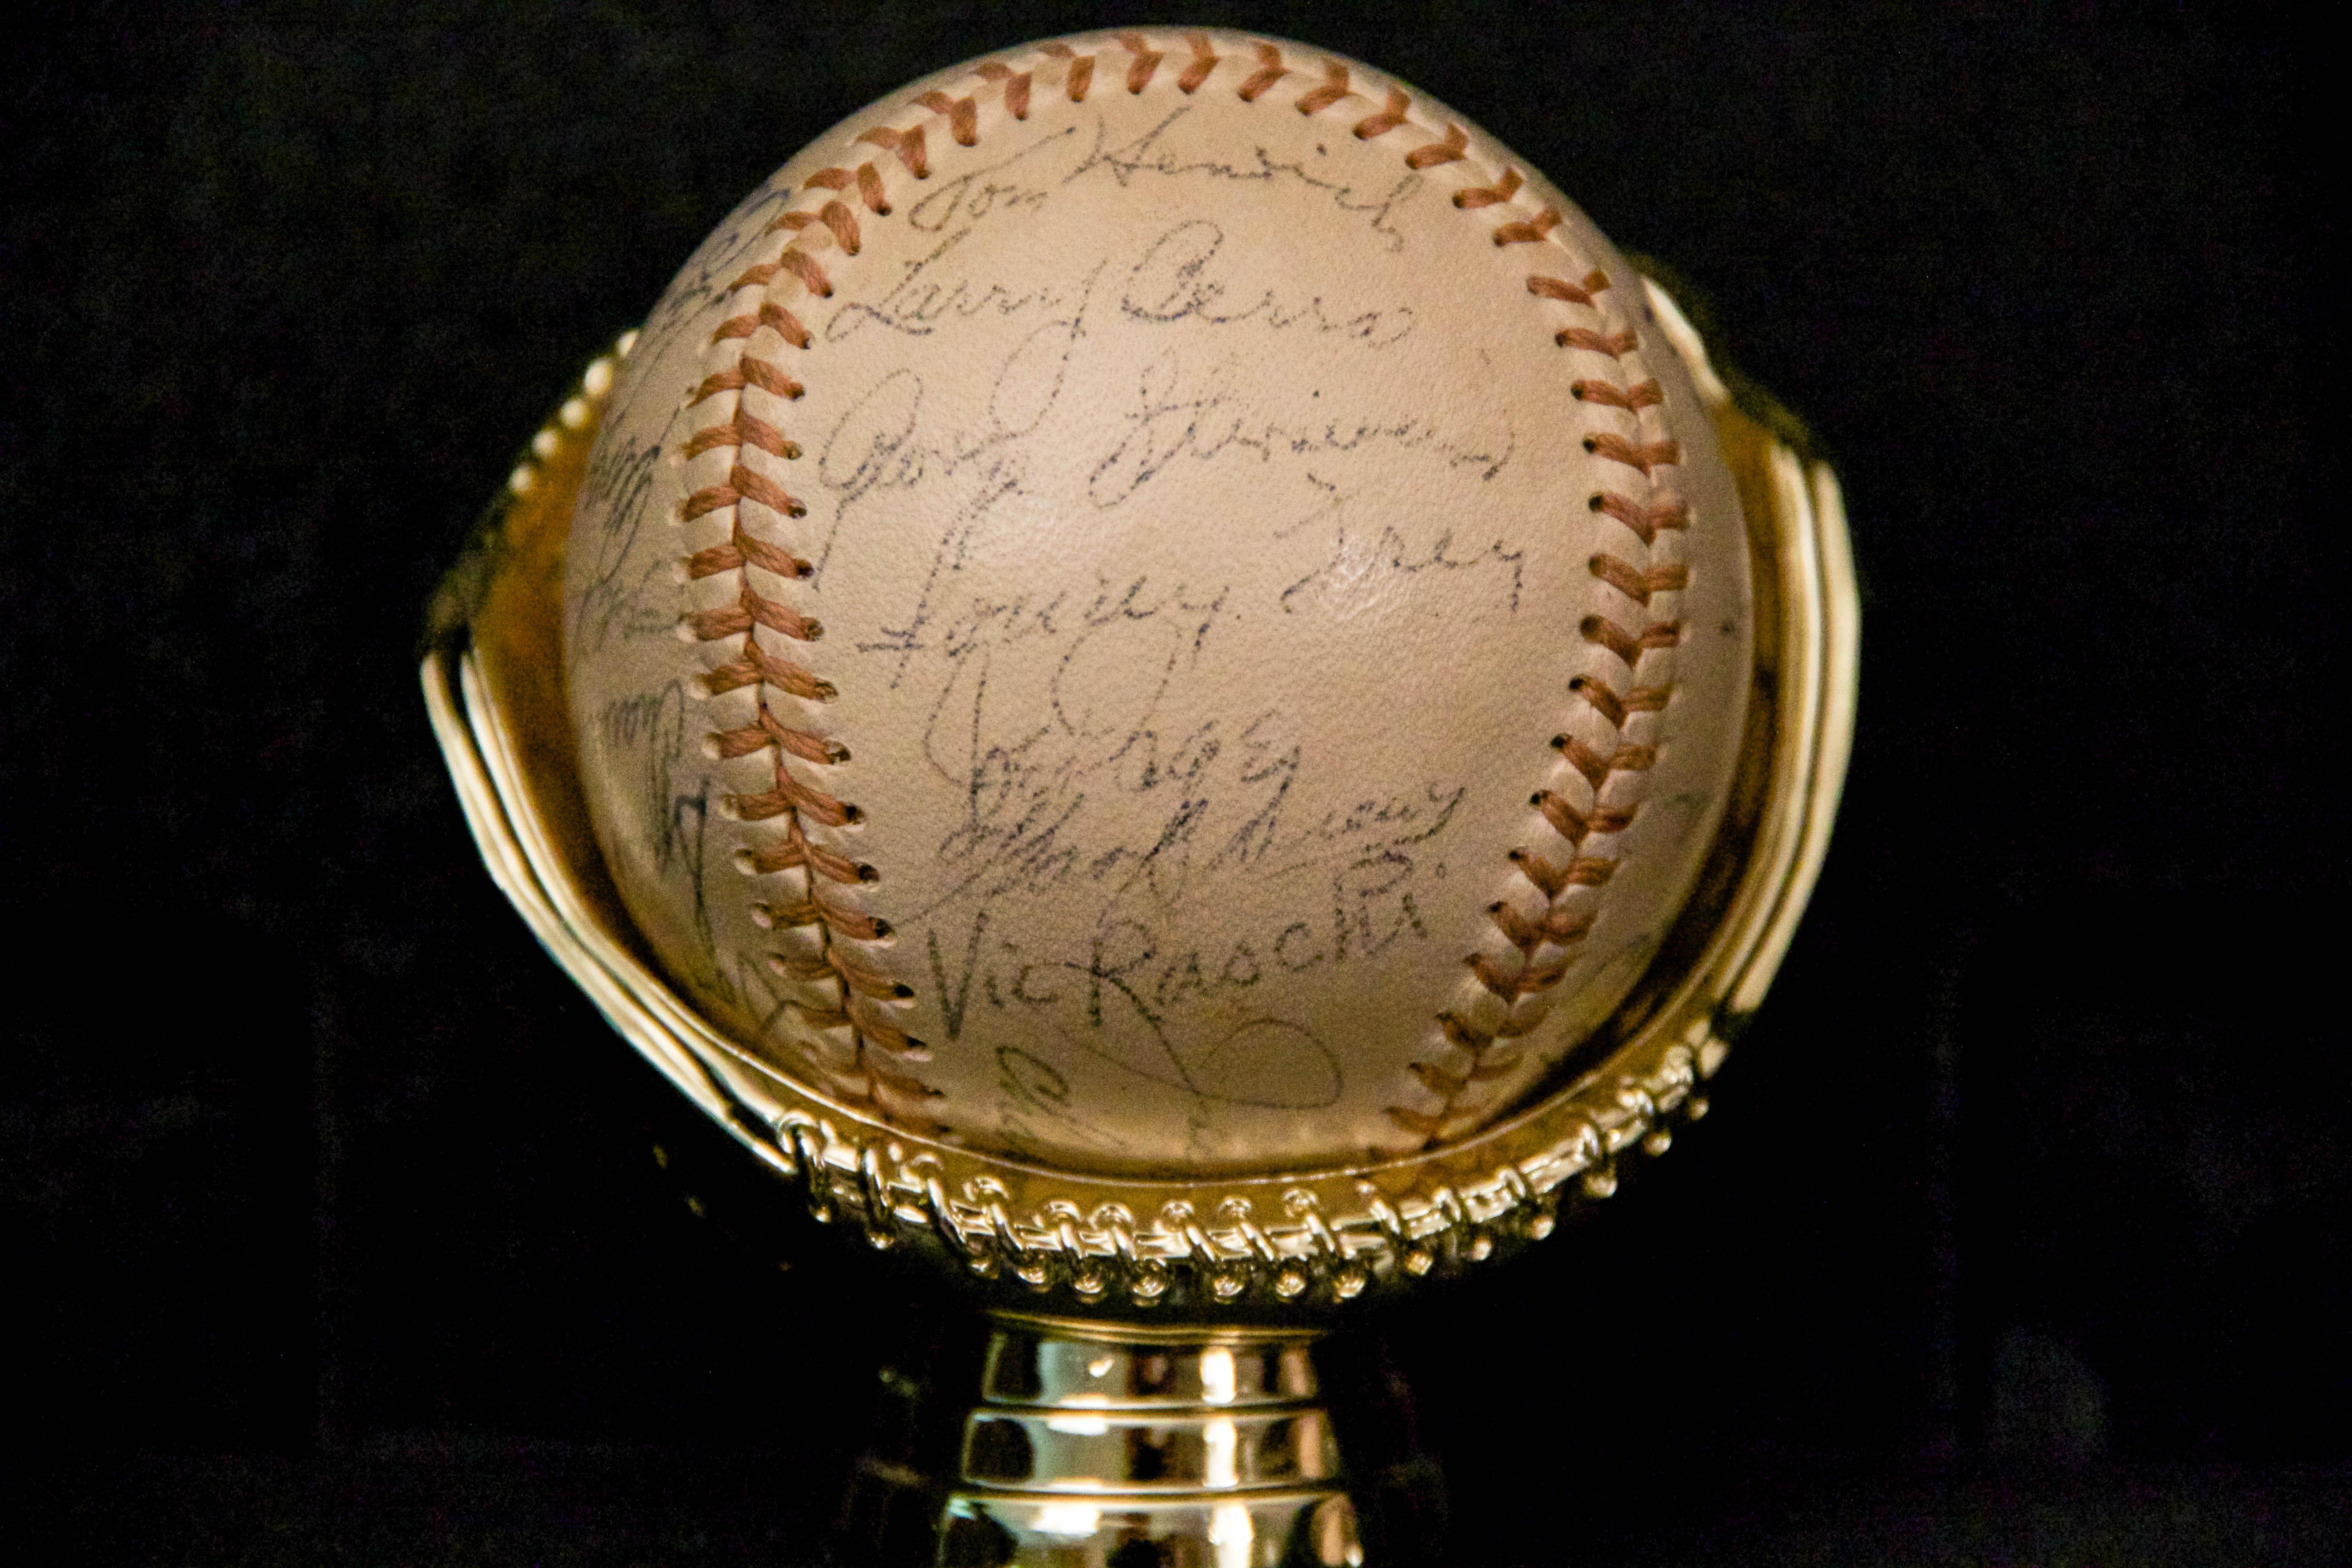 1947 World Series Champions